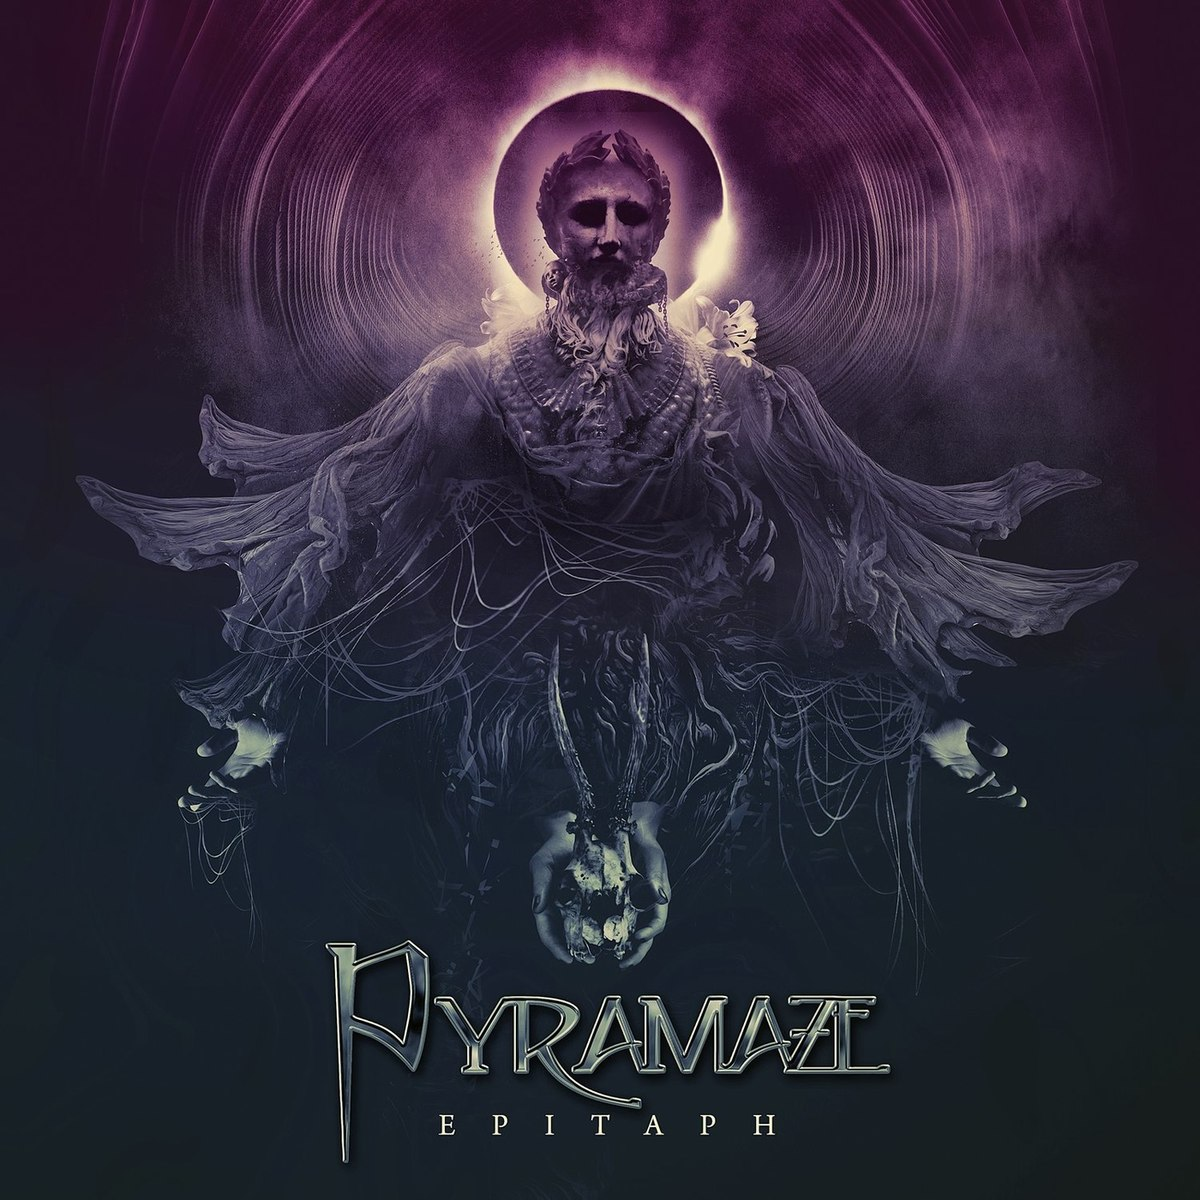 Pyramaze — Epitaph (2020)